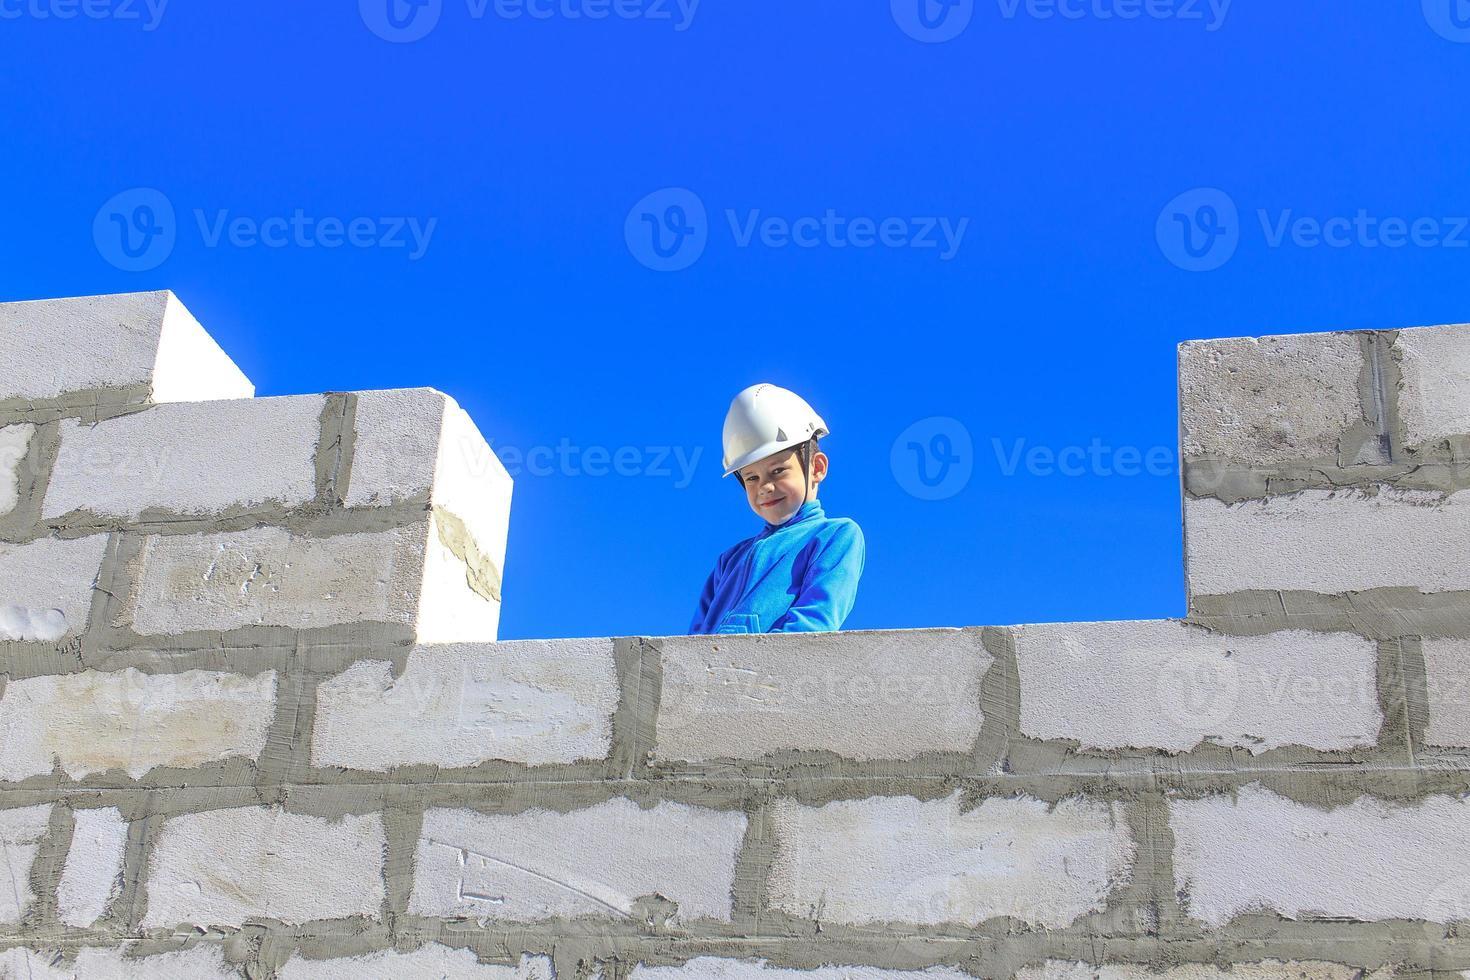 garçon sur un chantier photo